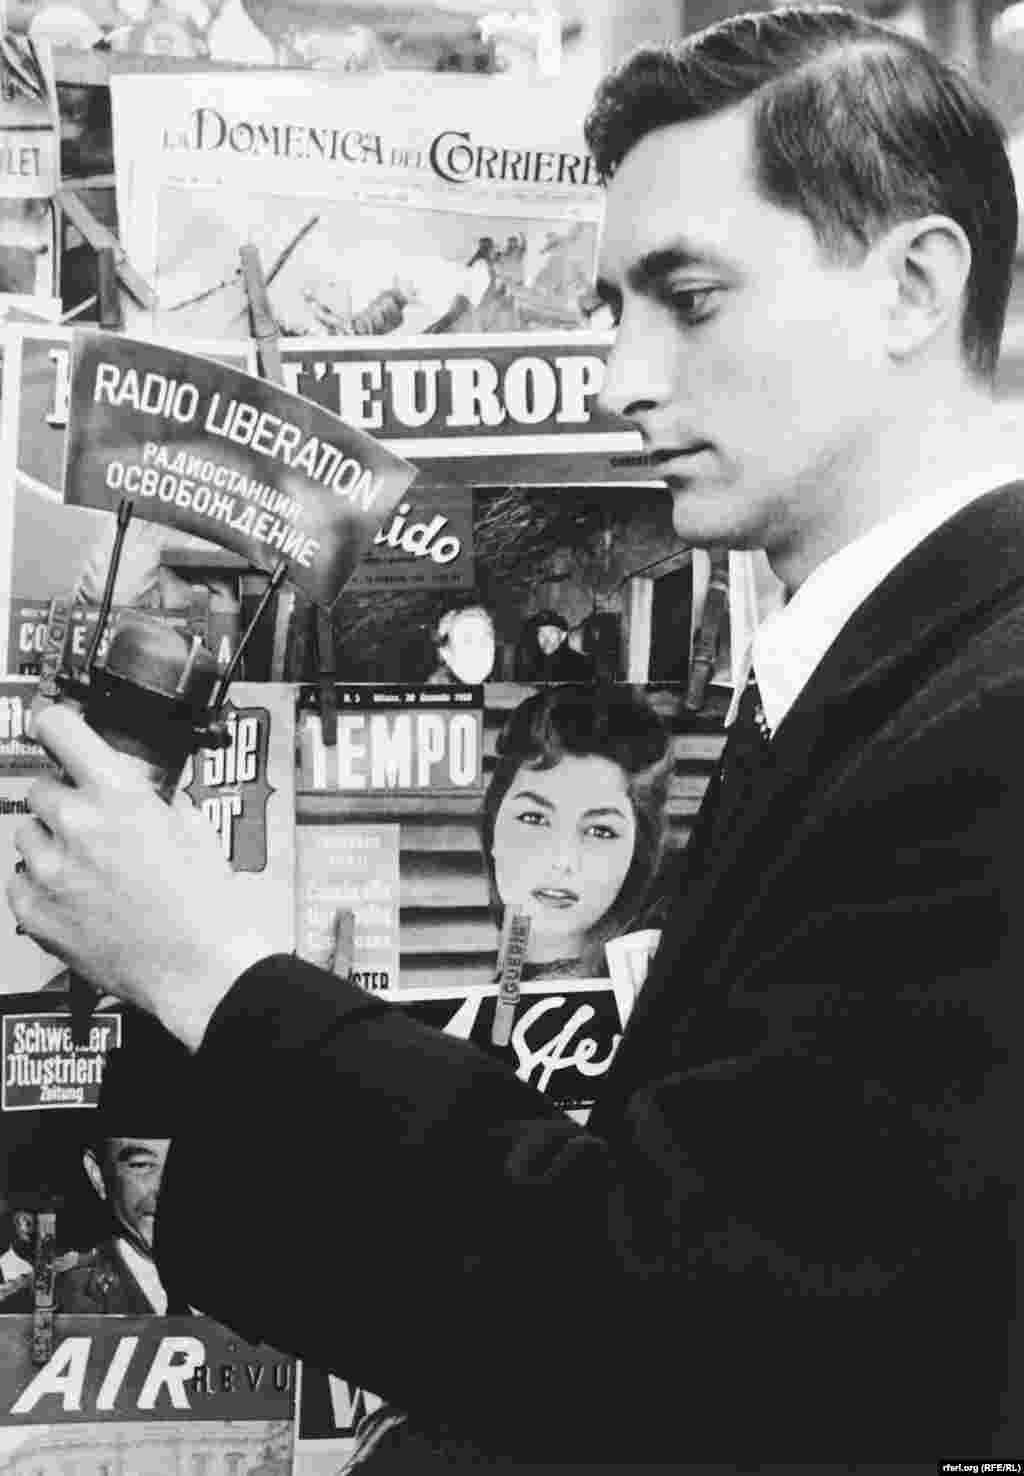 Radio Liberty journalist Valerian Obolensky in the 1950s.